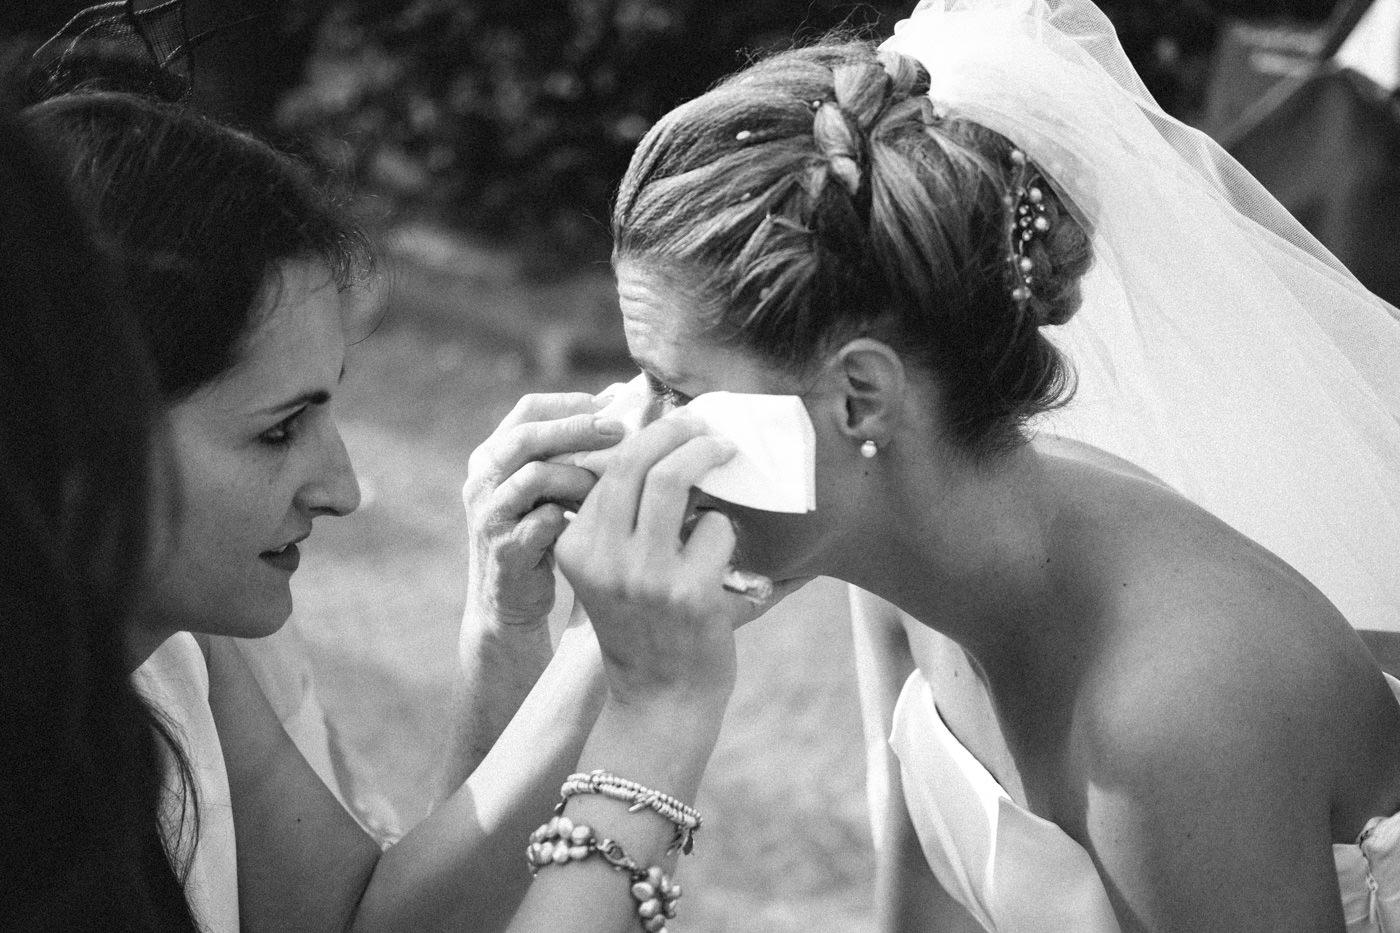 matrimoni_all_italiana_fotografo_matrimonio_cinque_terre-36.jpg